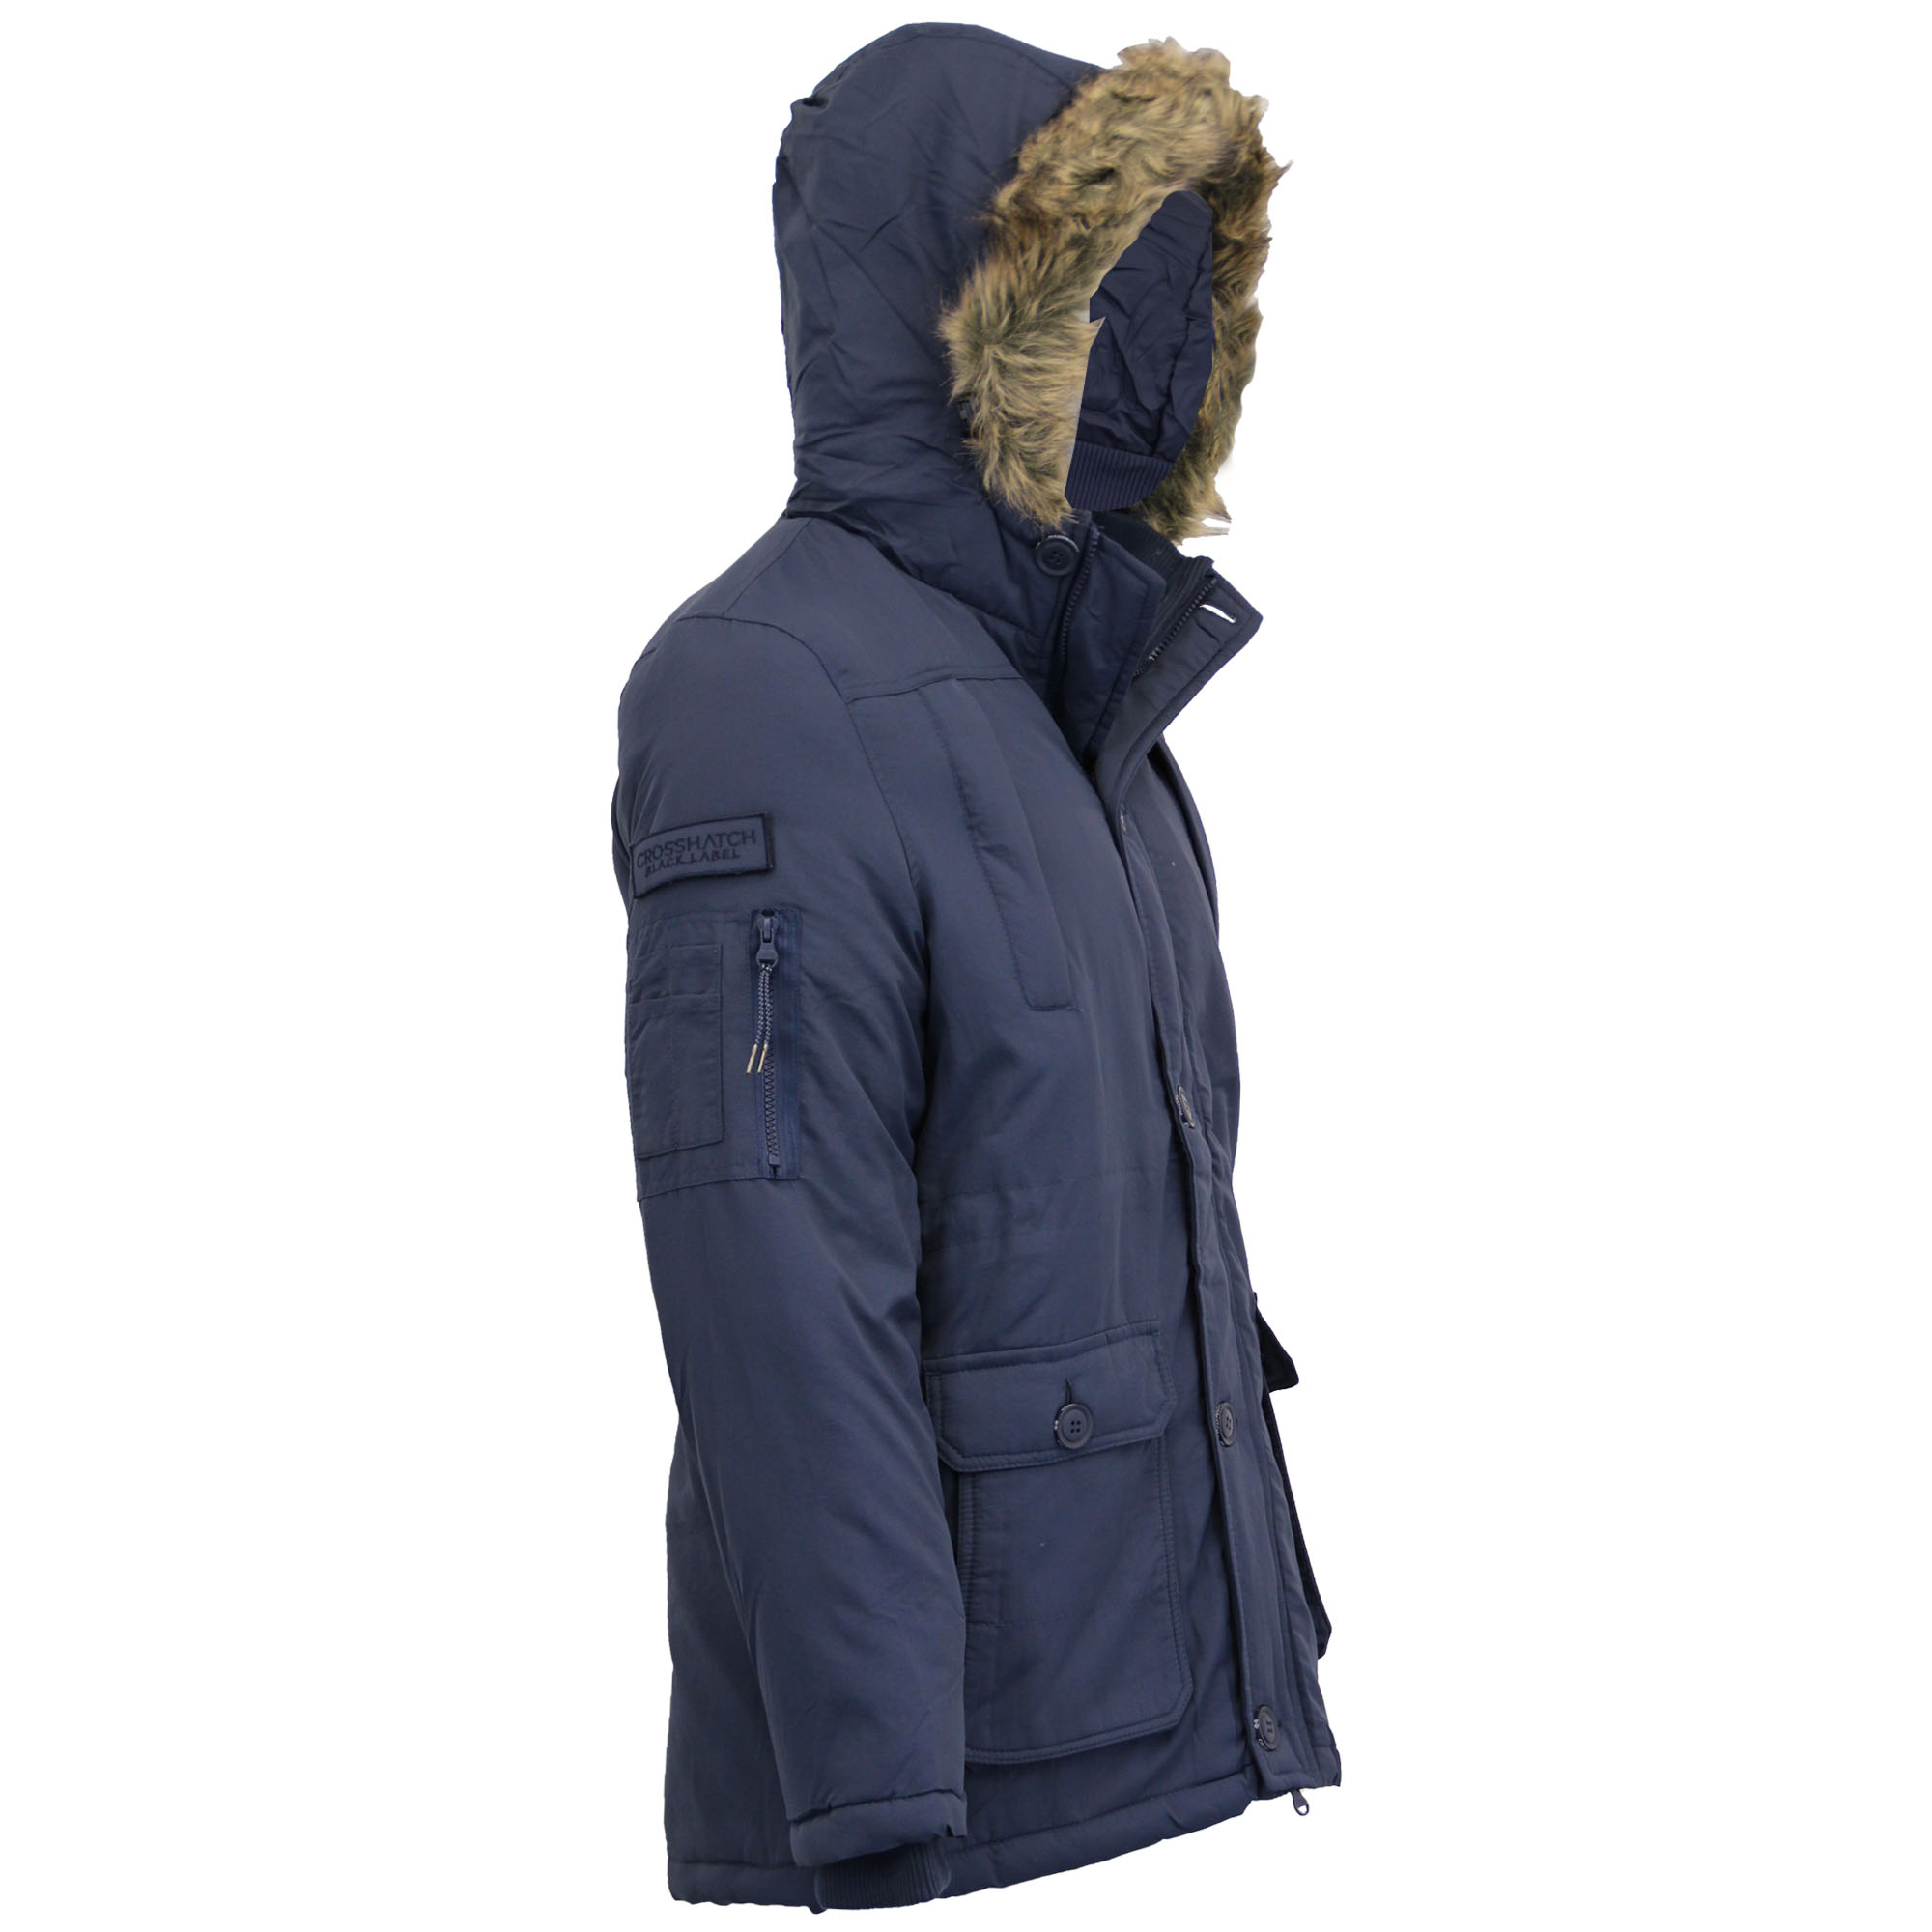 New Mens Parka Jacket Crosshatch Coat Hoodie Padded Faux Fur Zip Winter Lined